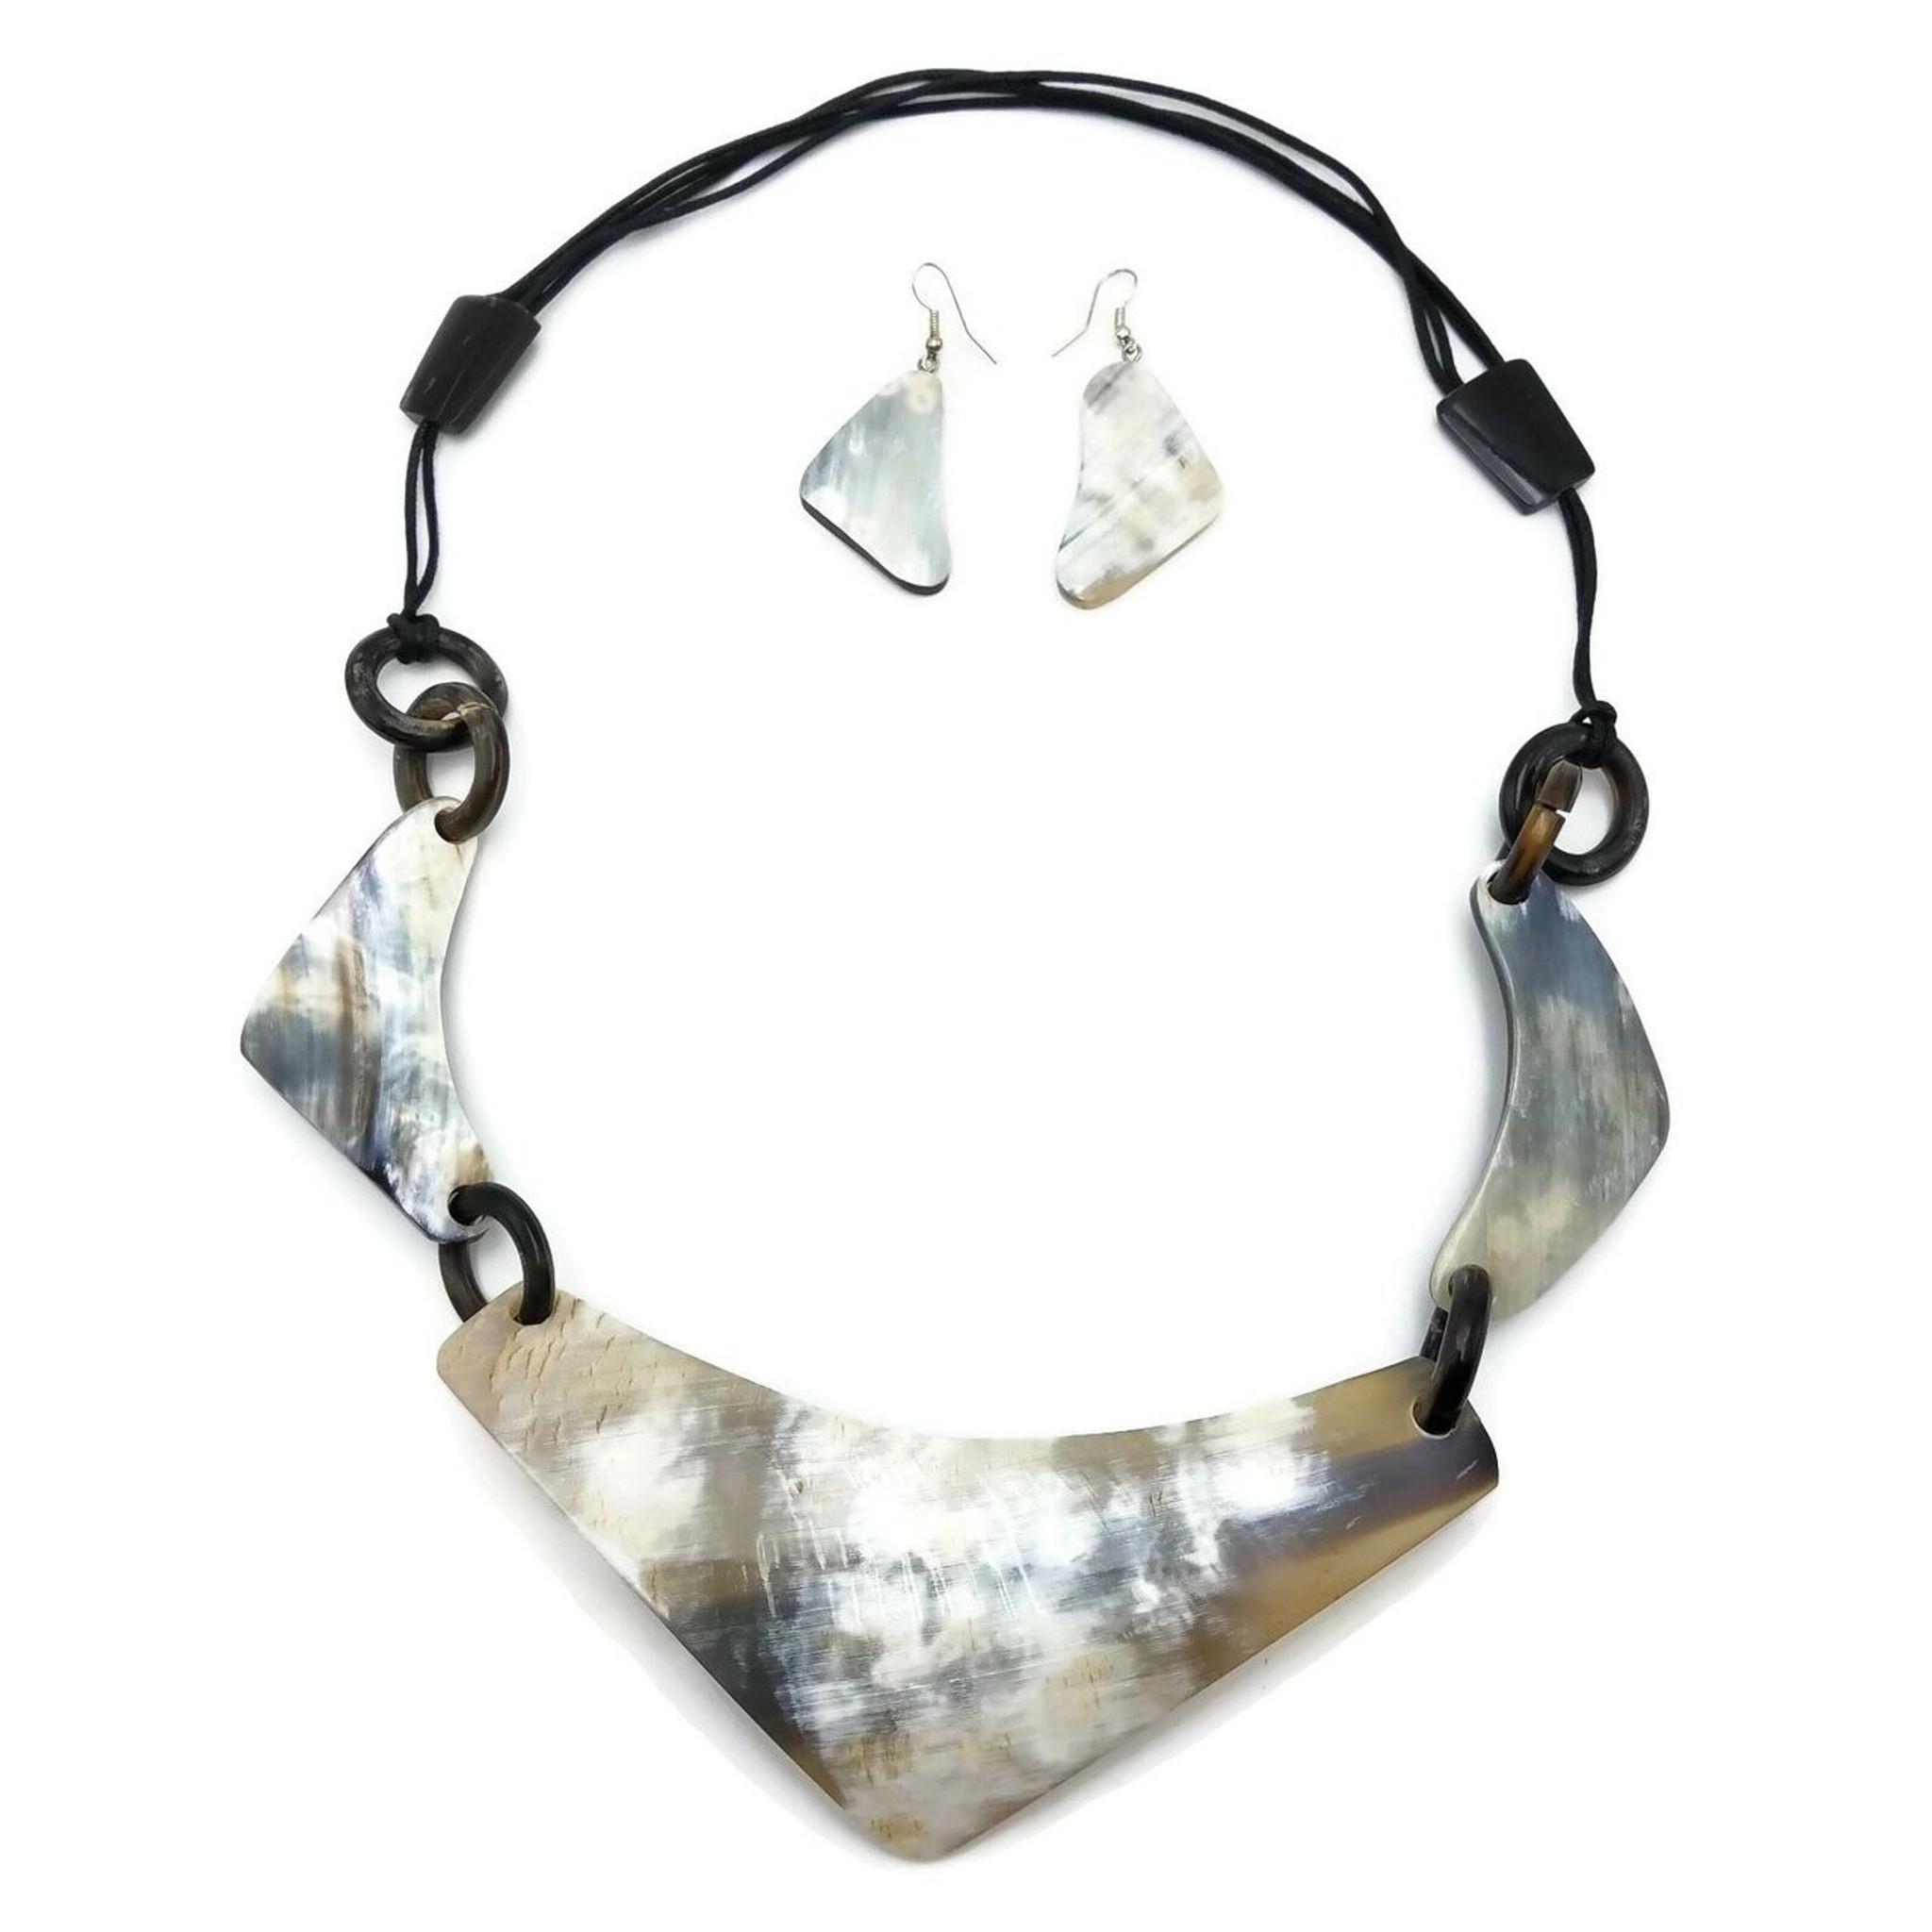 Buffalo Horn Necklace Set Pendants Handmade Neck Plate and Earring